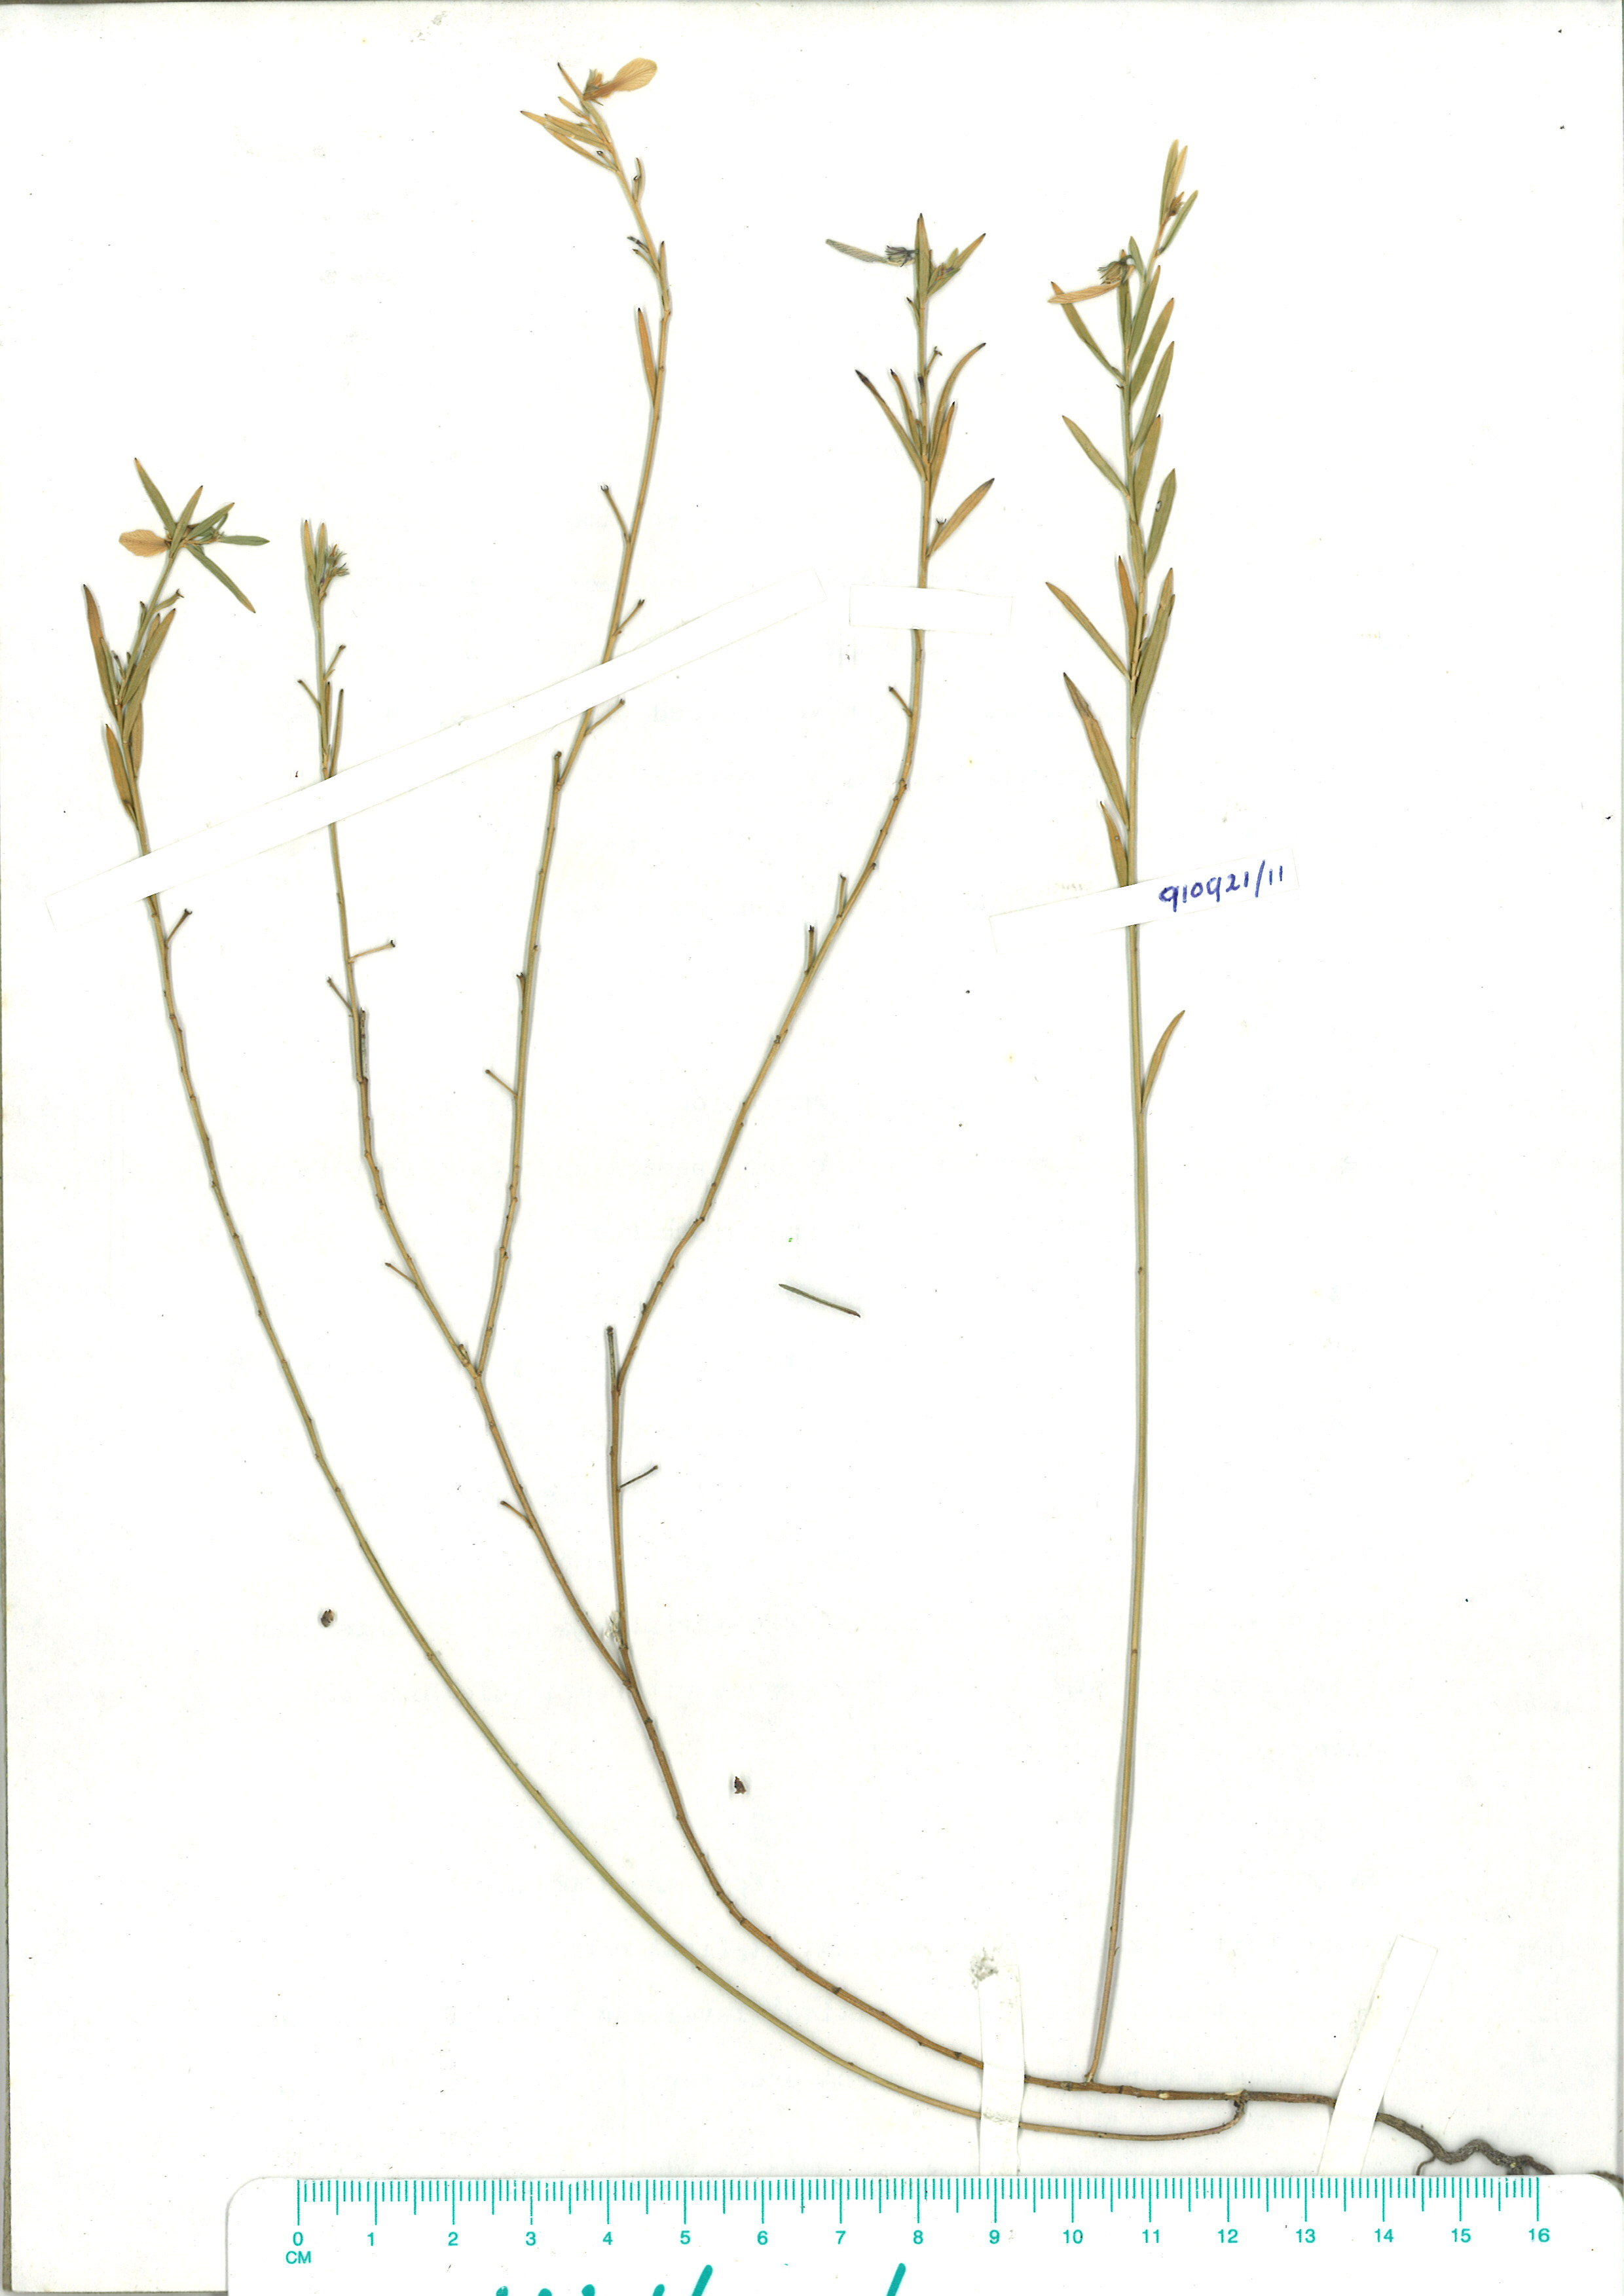 Scanned herbarium image Hybanthus vernonii